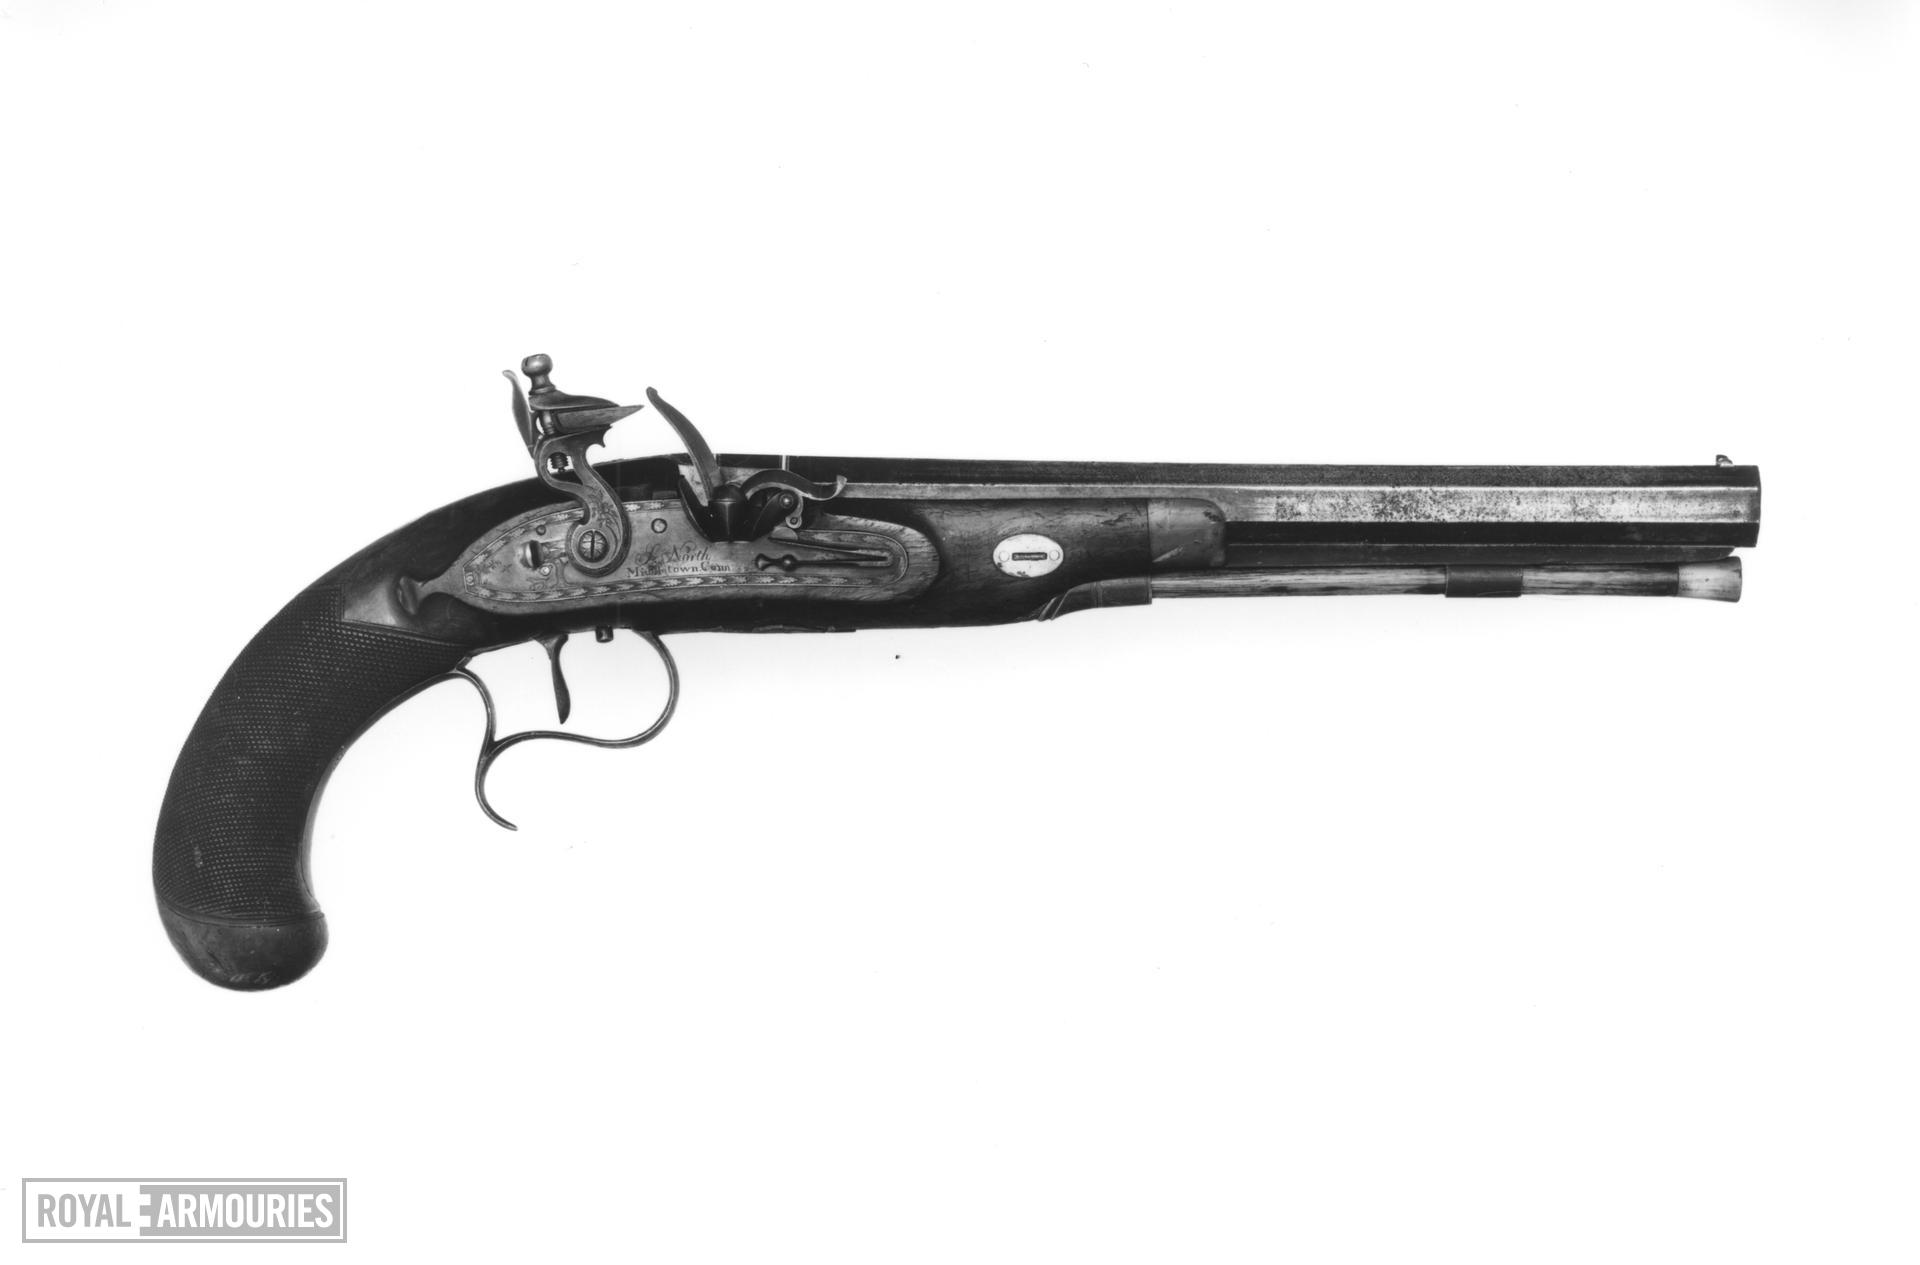 Flintlock duelling pistol - By Simeon North